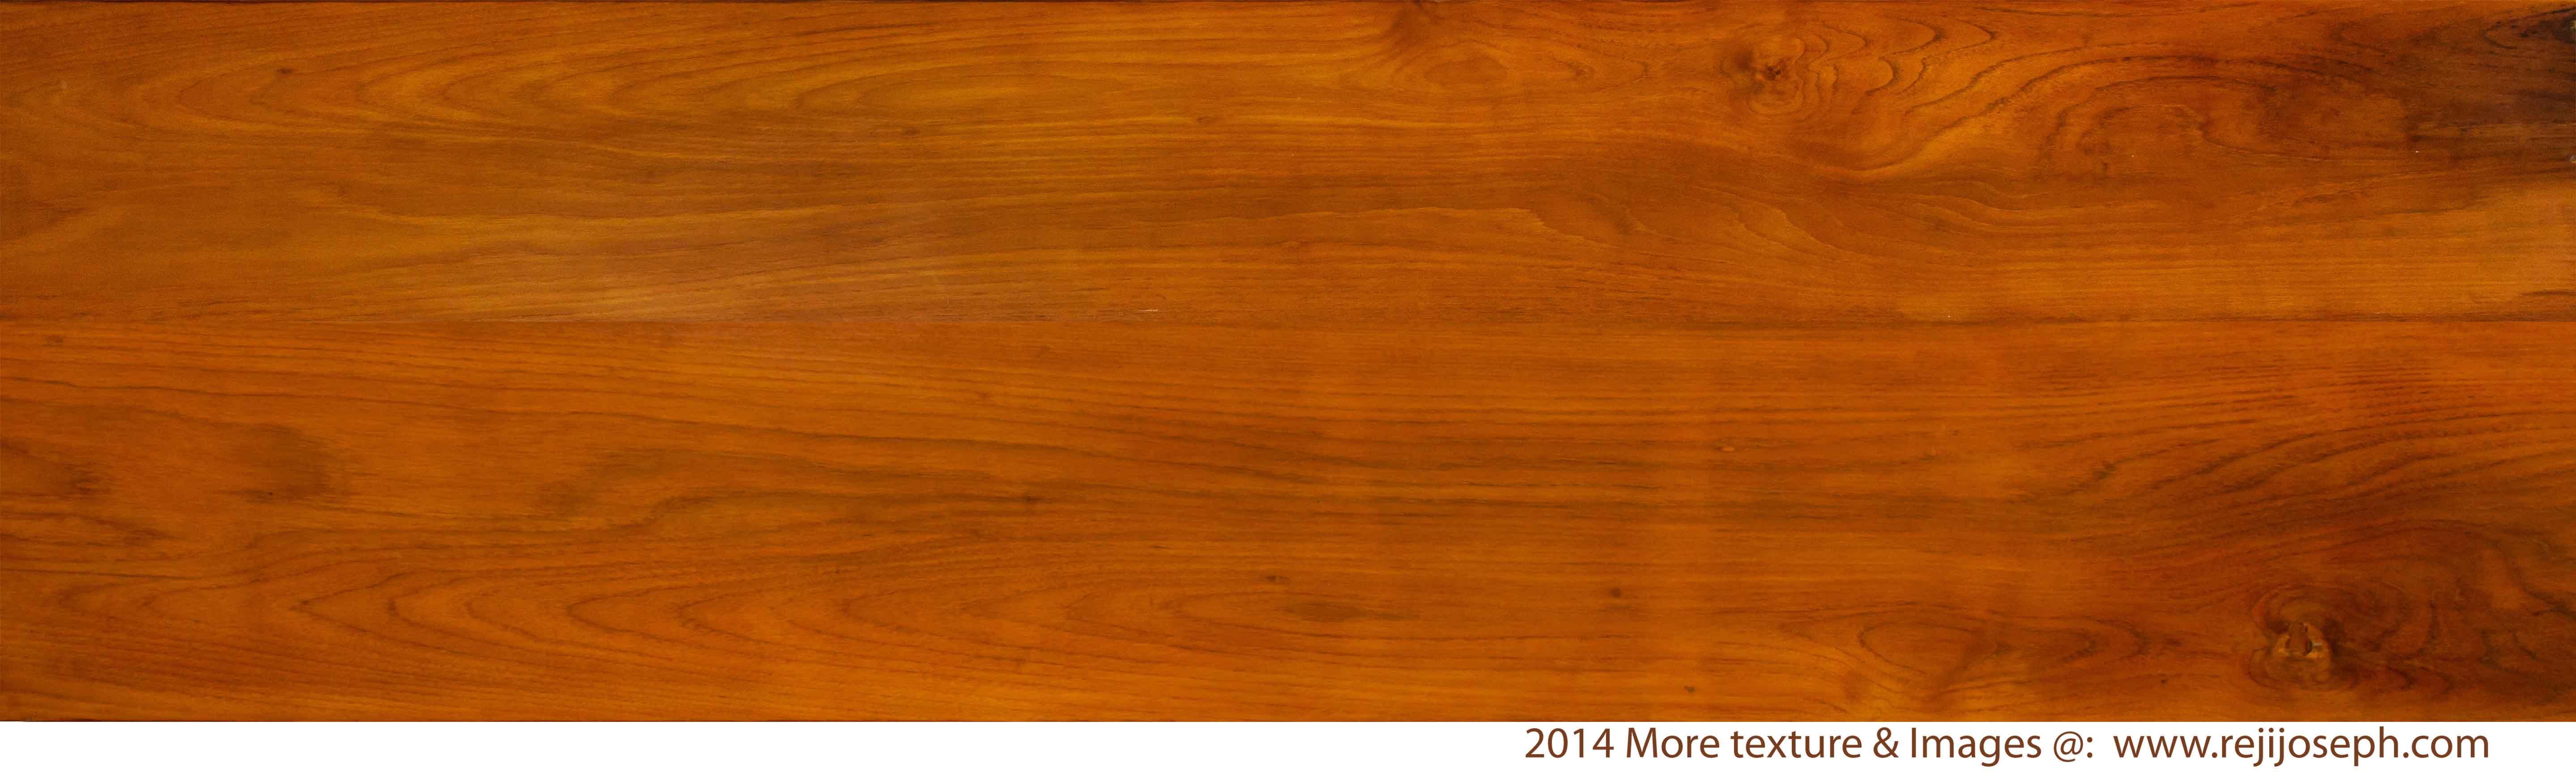 Plane Wood texture 00004